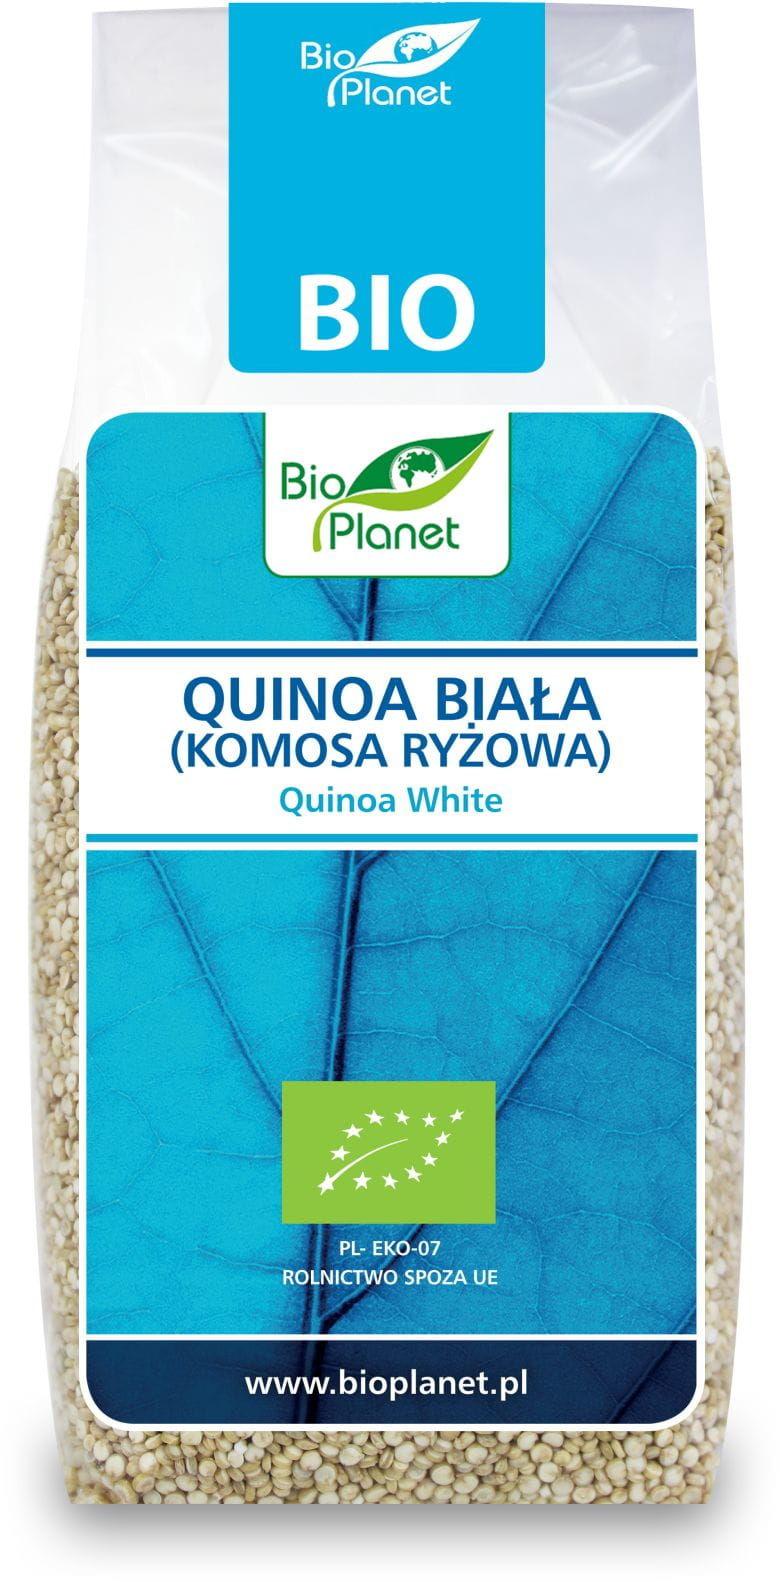 Quinoa Biała Komosa Ryżowa BIO 250g - Bio Planet